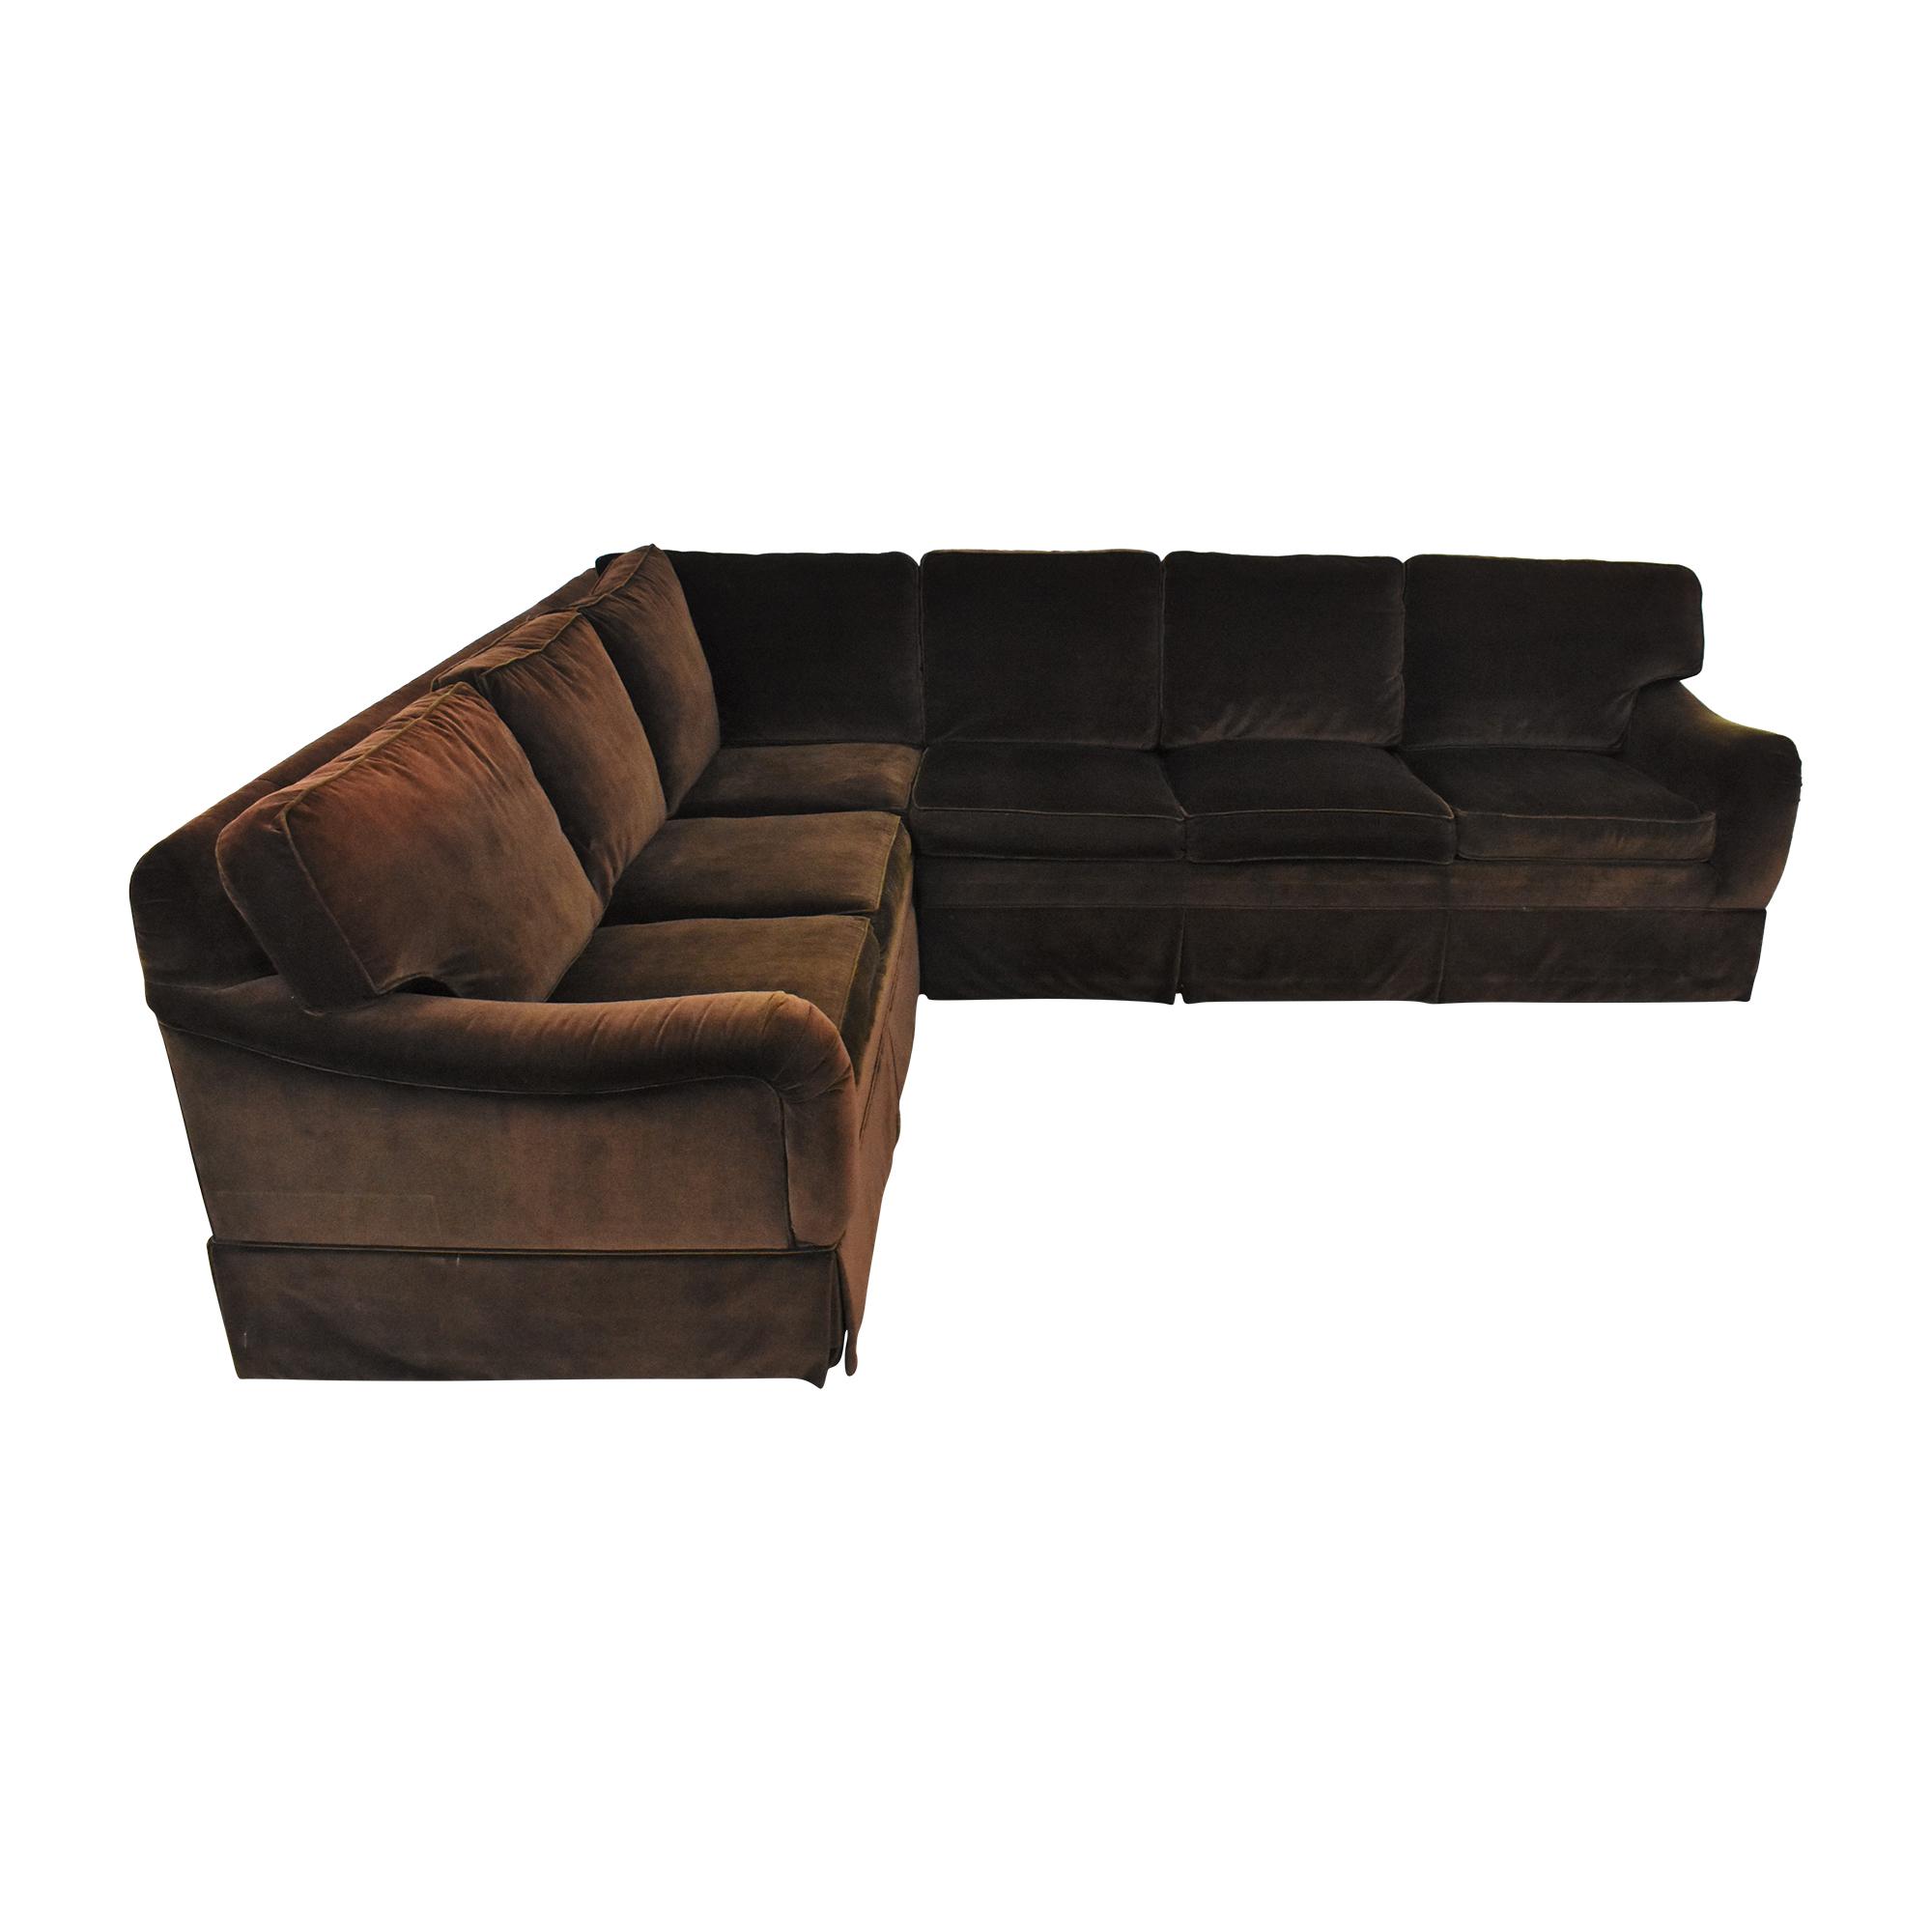 Ethan Allen L Shaped Sectional Sofa Ethan Allen